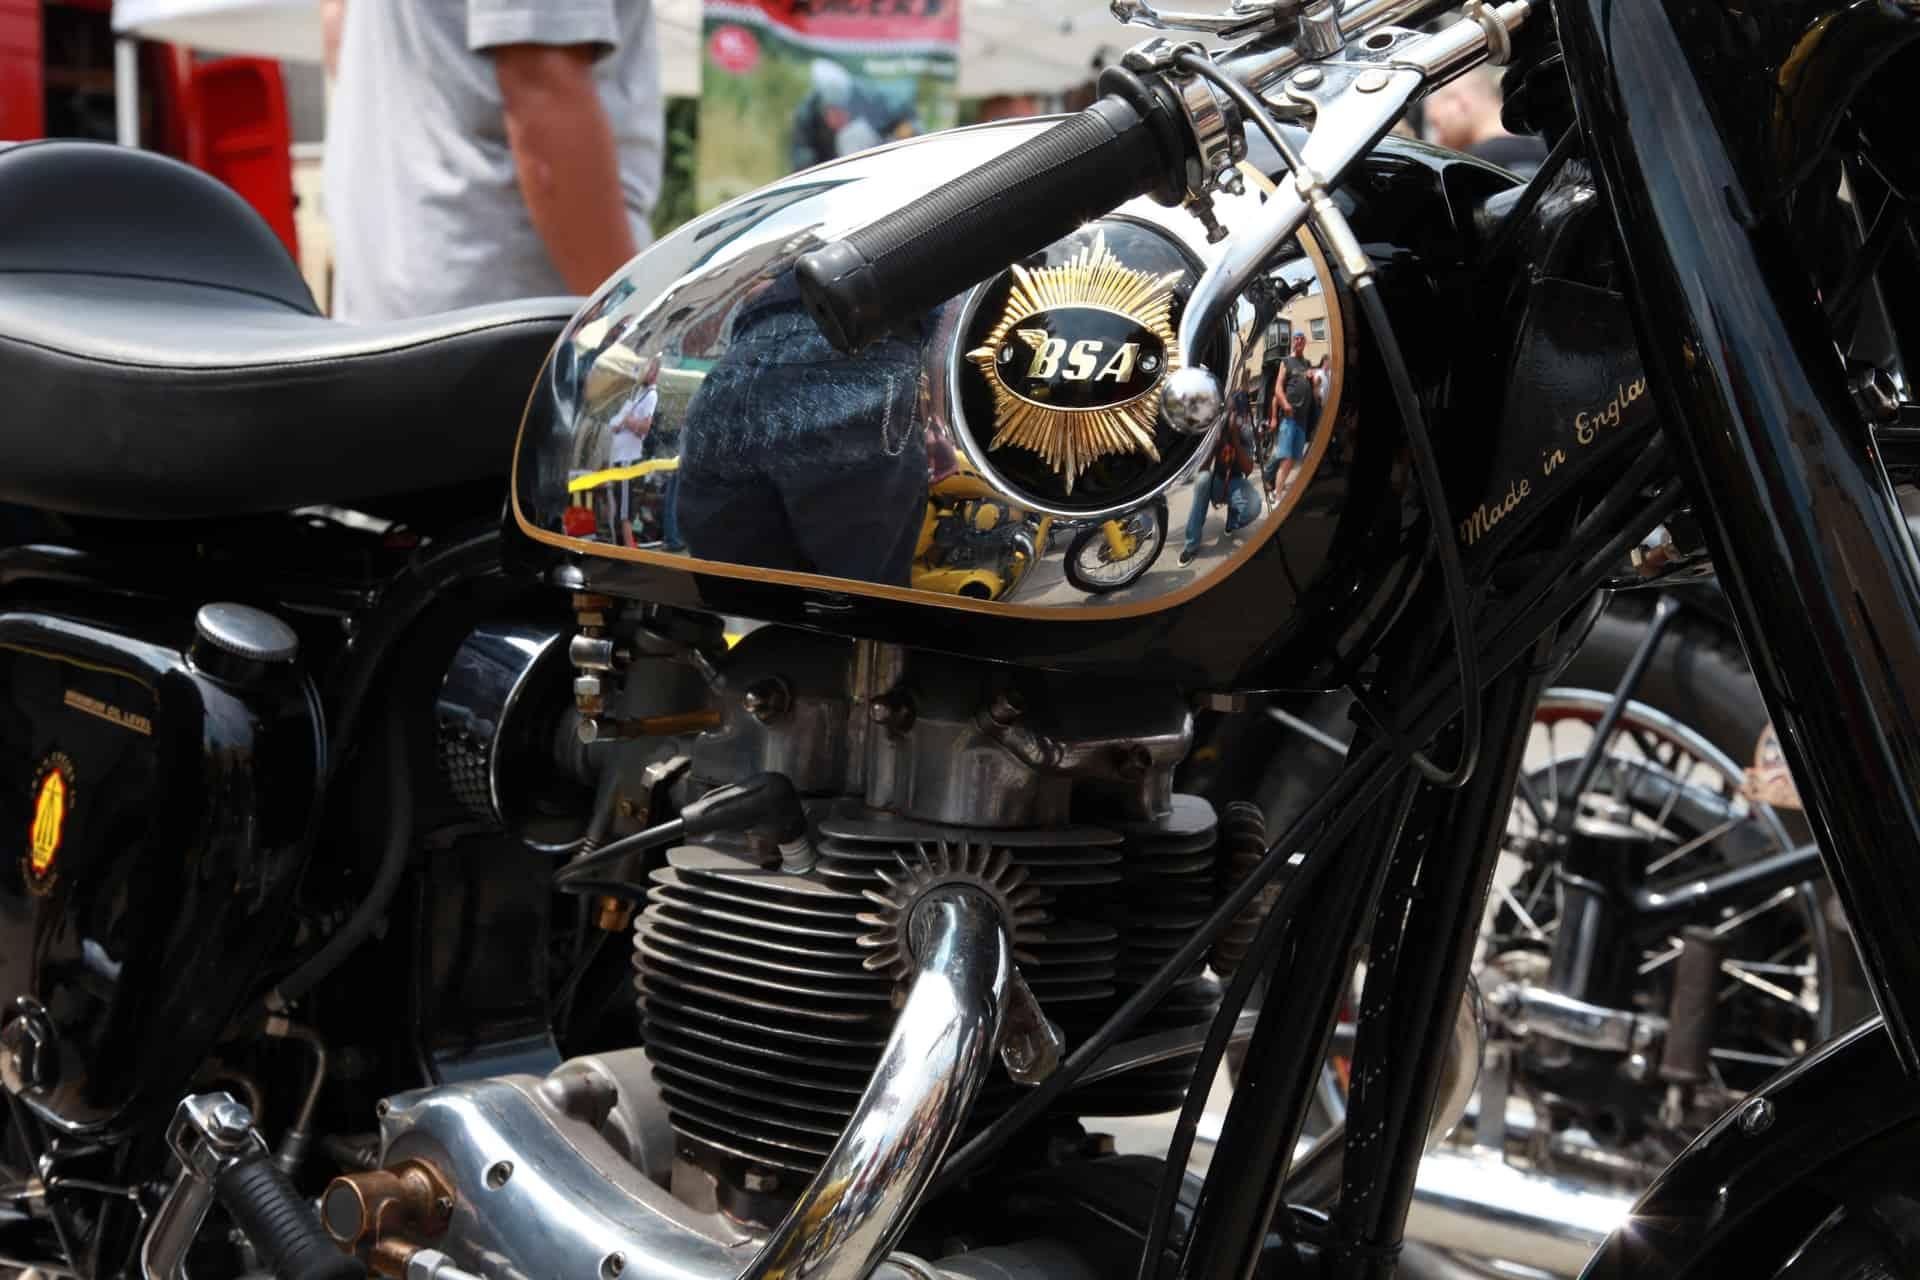 jet kit engine motorcycle